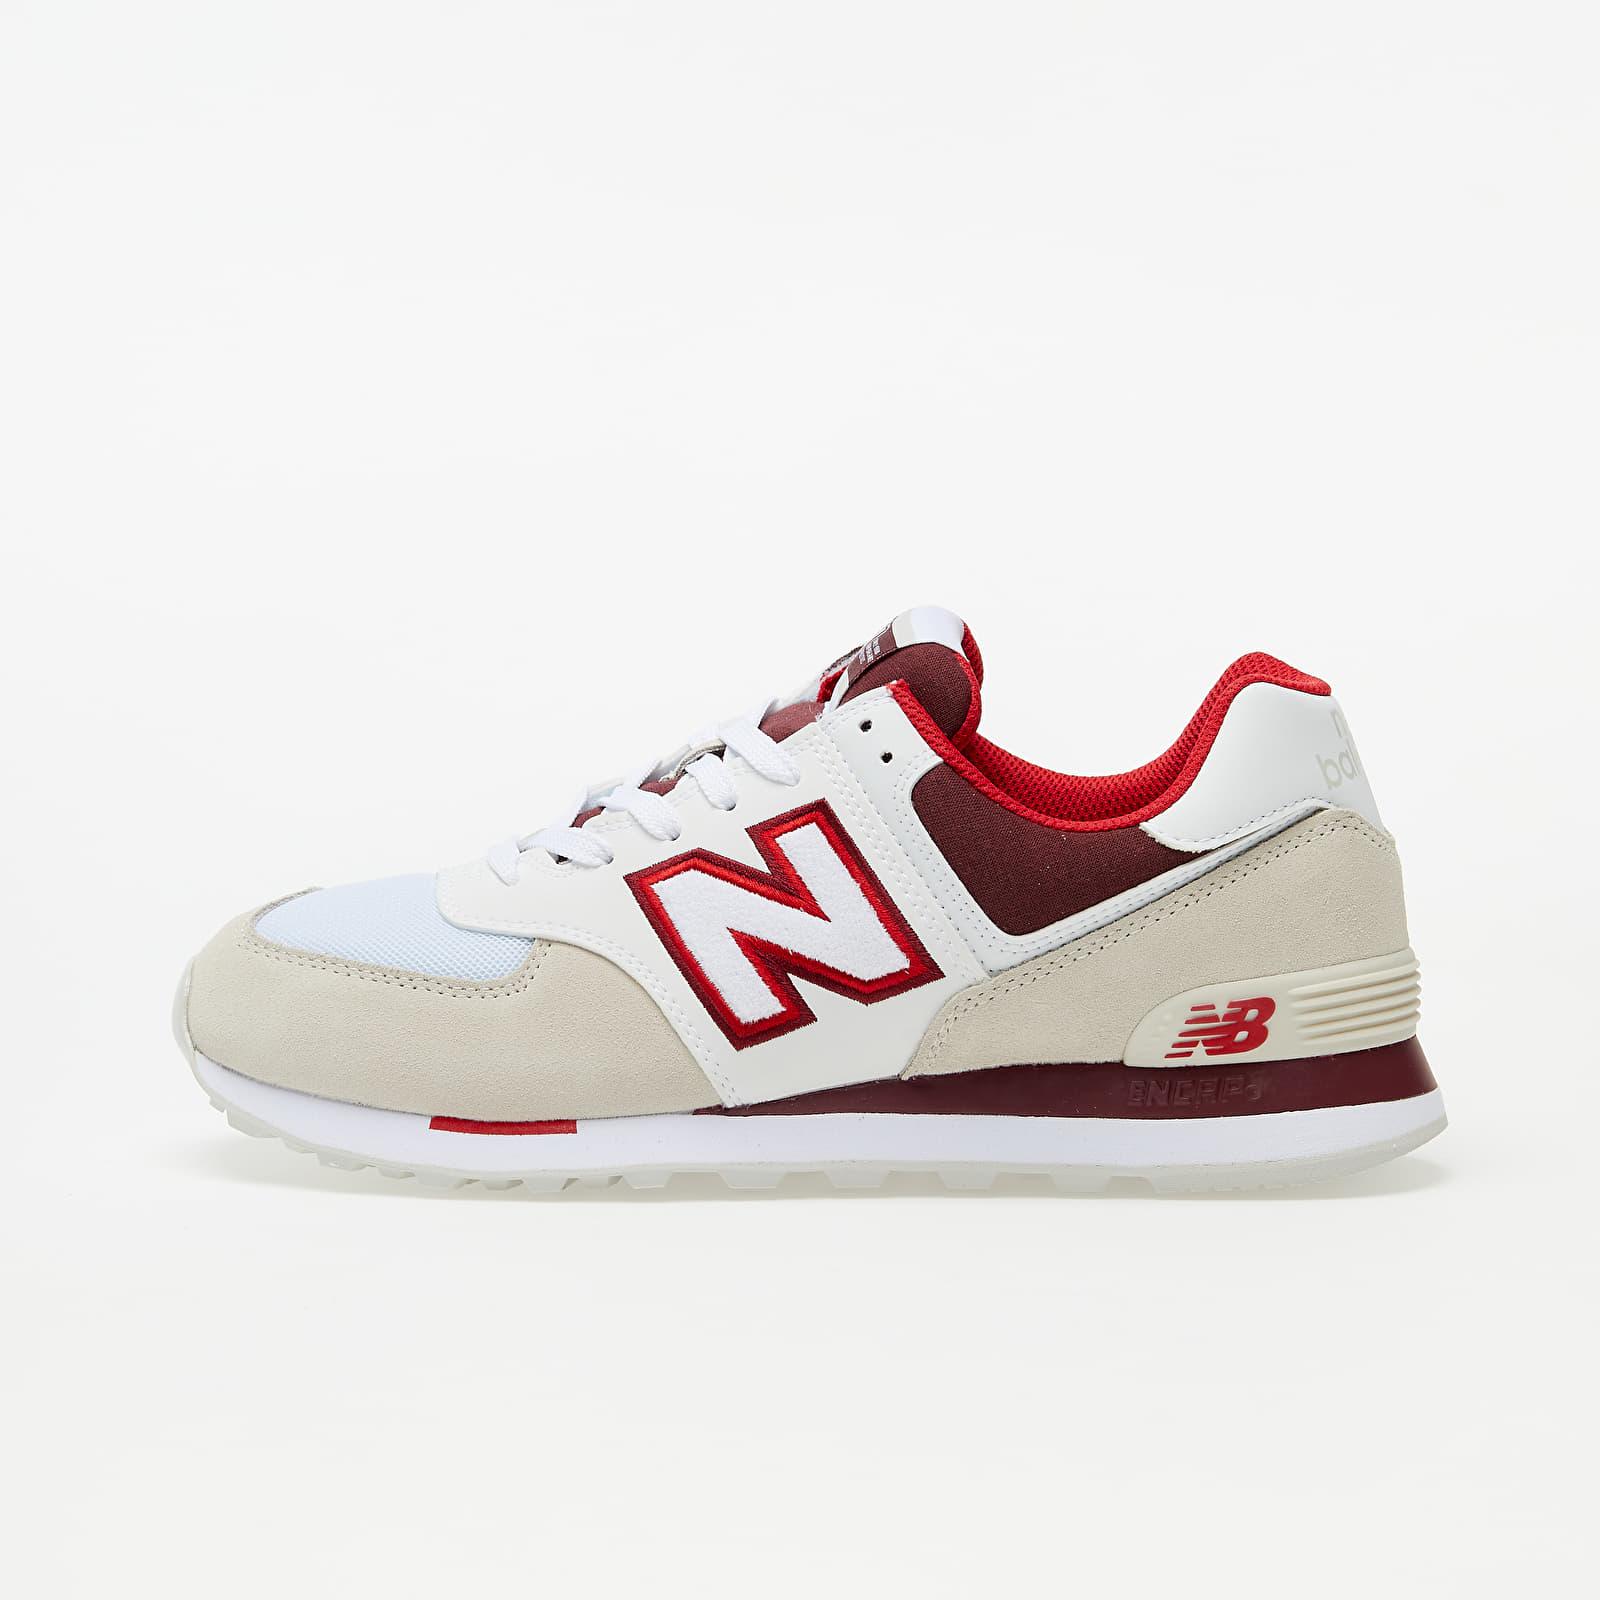 New Balance 574 Beige/ White/ Red EUR 45